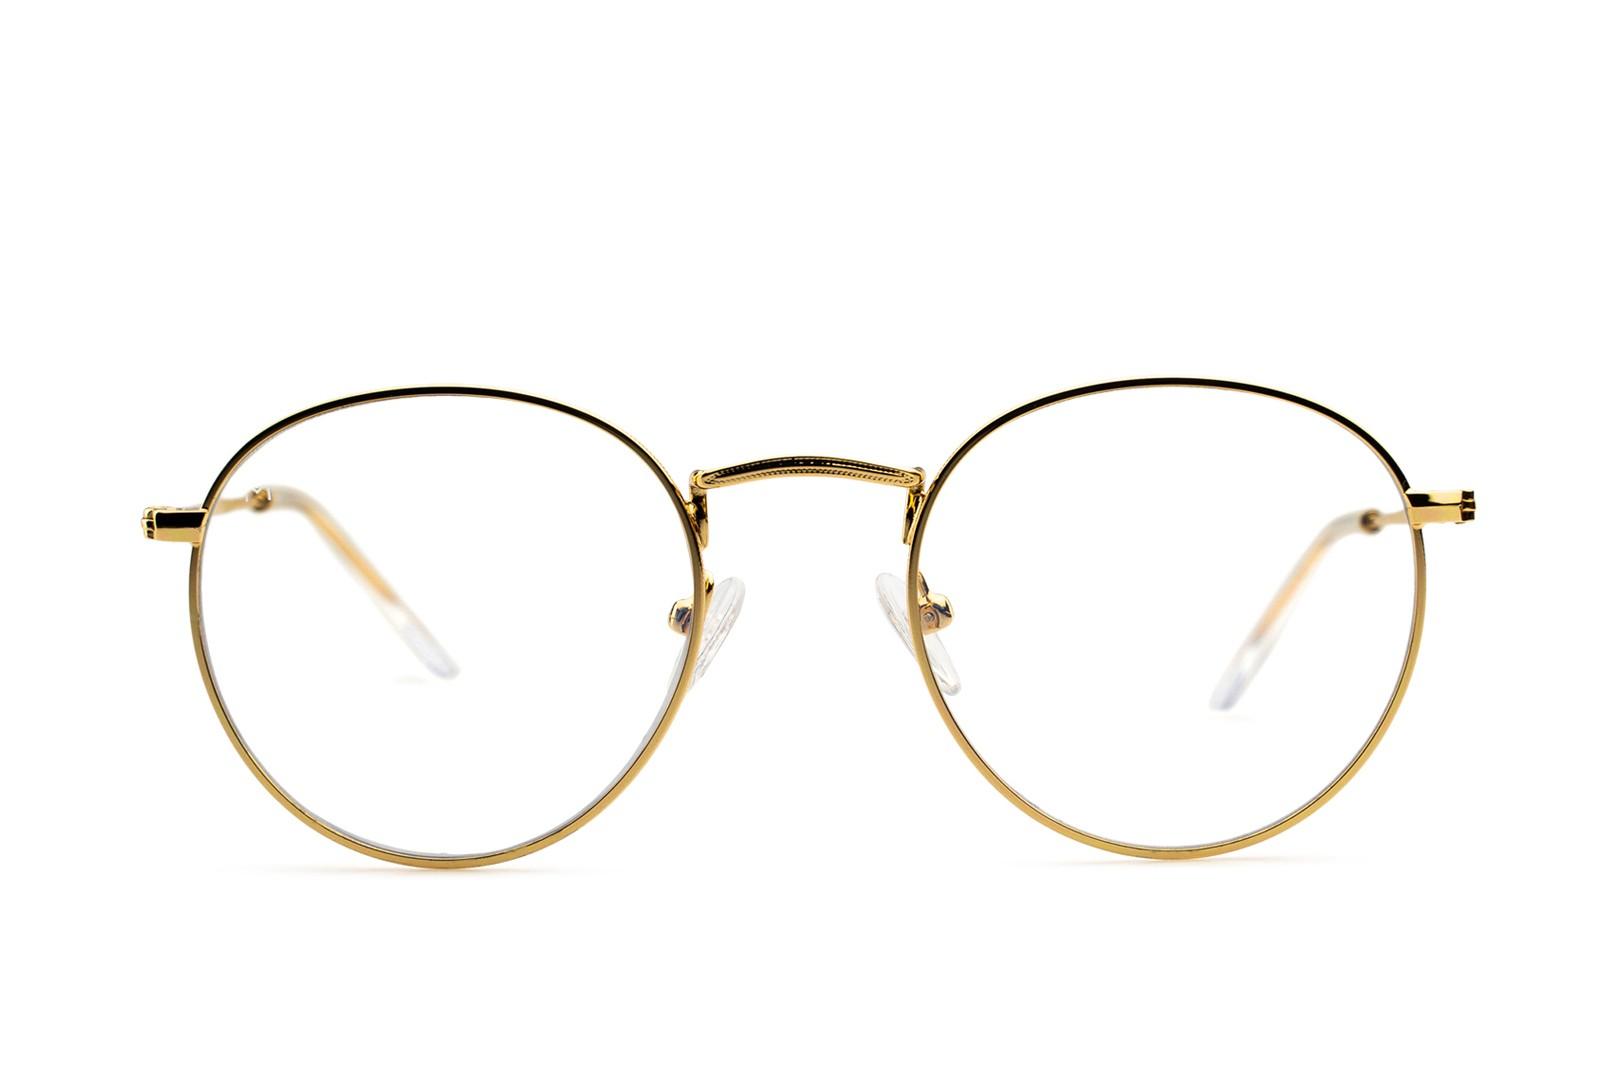 Meller Yster Gold blue light computerbril